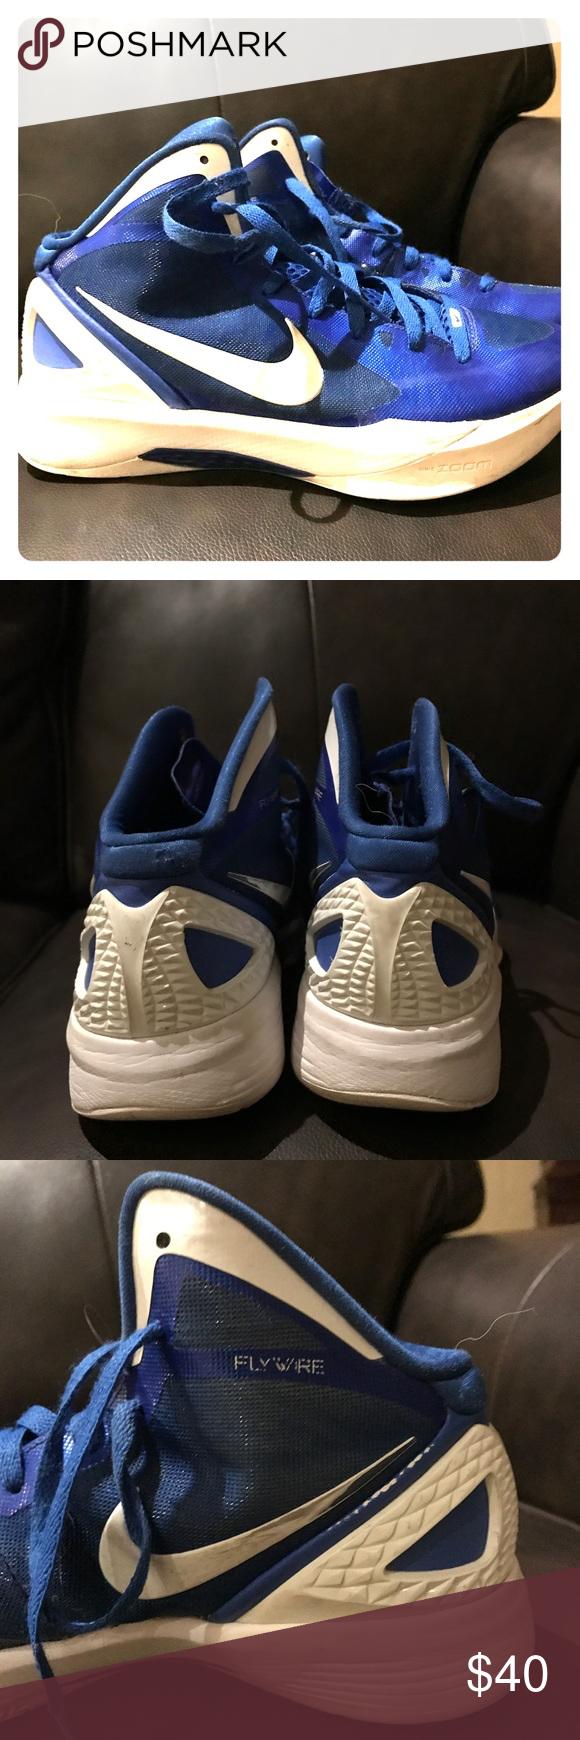 488237a31a3 Nike Hyperdunk women s basketball shoes size 10 Great condition Nike  women s basketball shoes size 10 Navy Nike Shoes Athletic Shoes